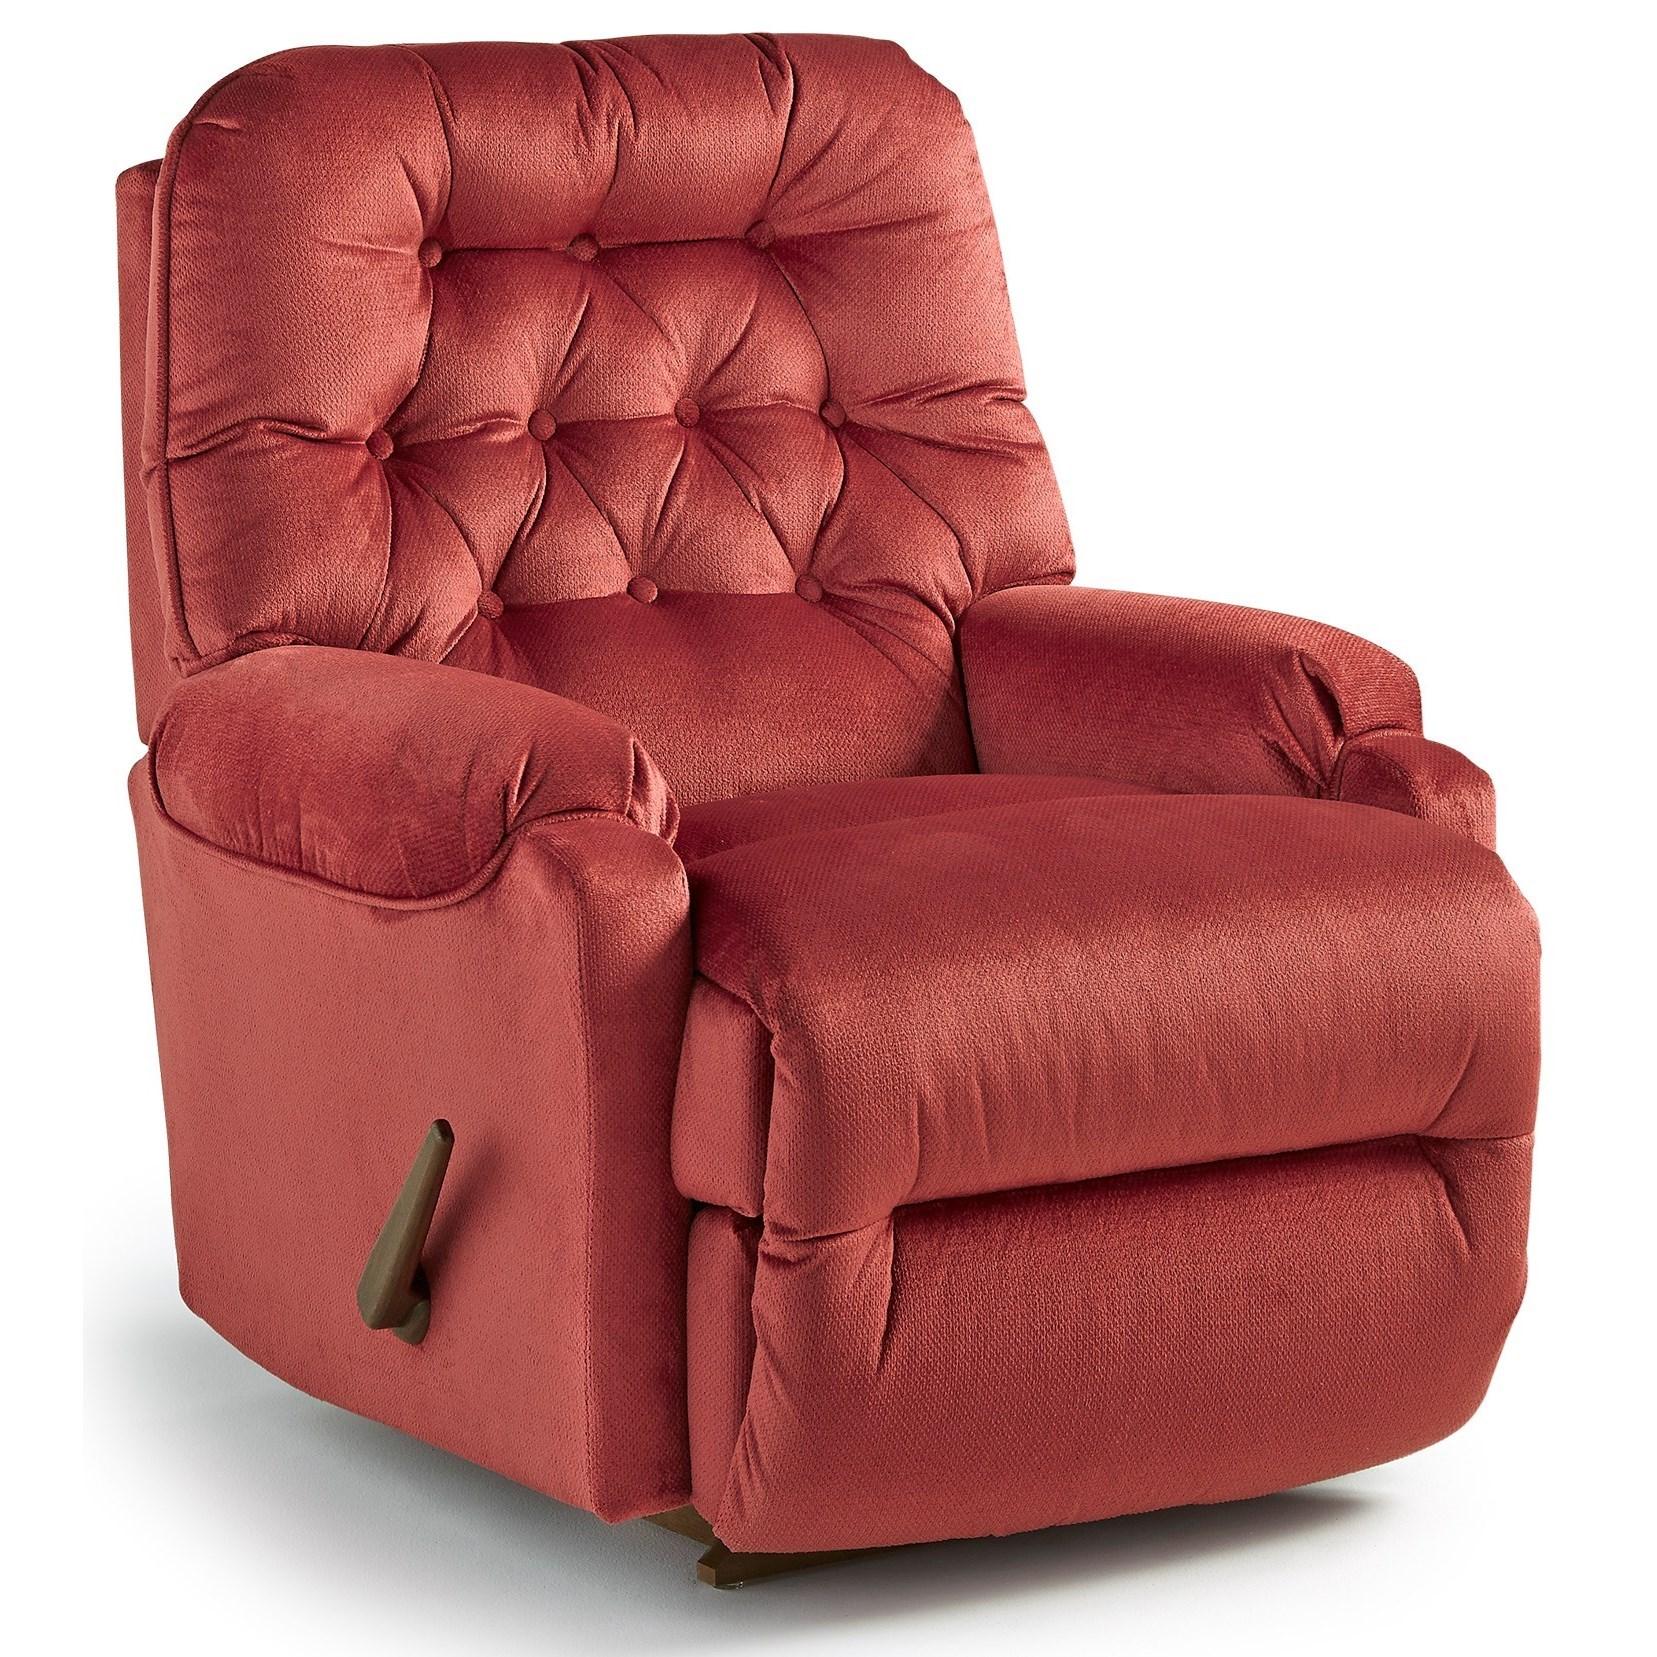 Petite Recliners Brena Rocker Recliner by Best Home Furnishings at Lucas Furniture & Mattress